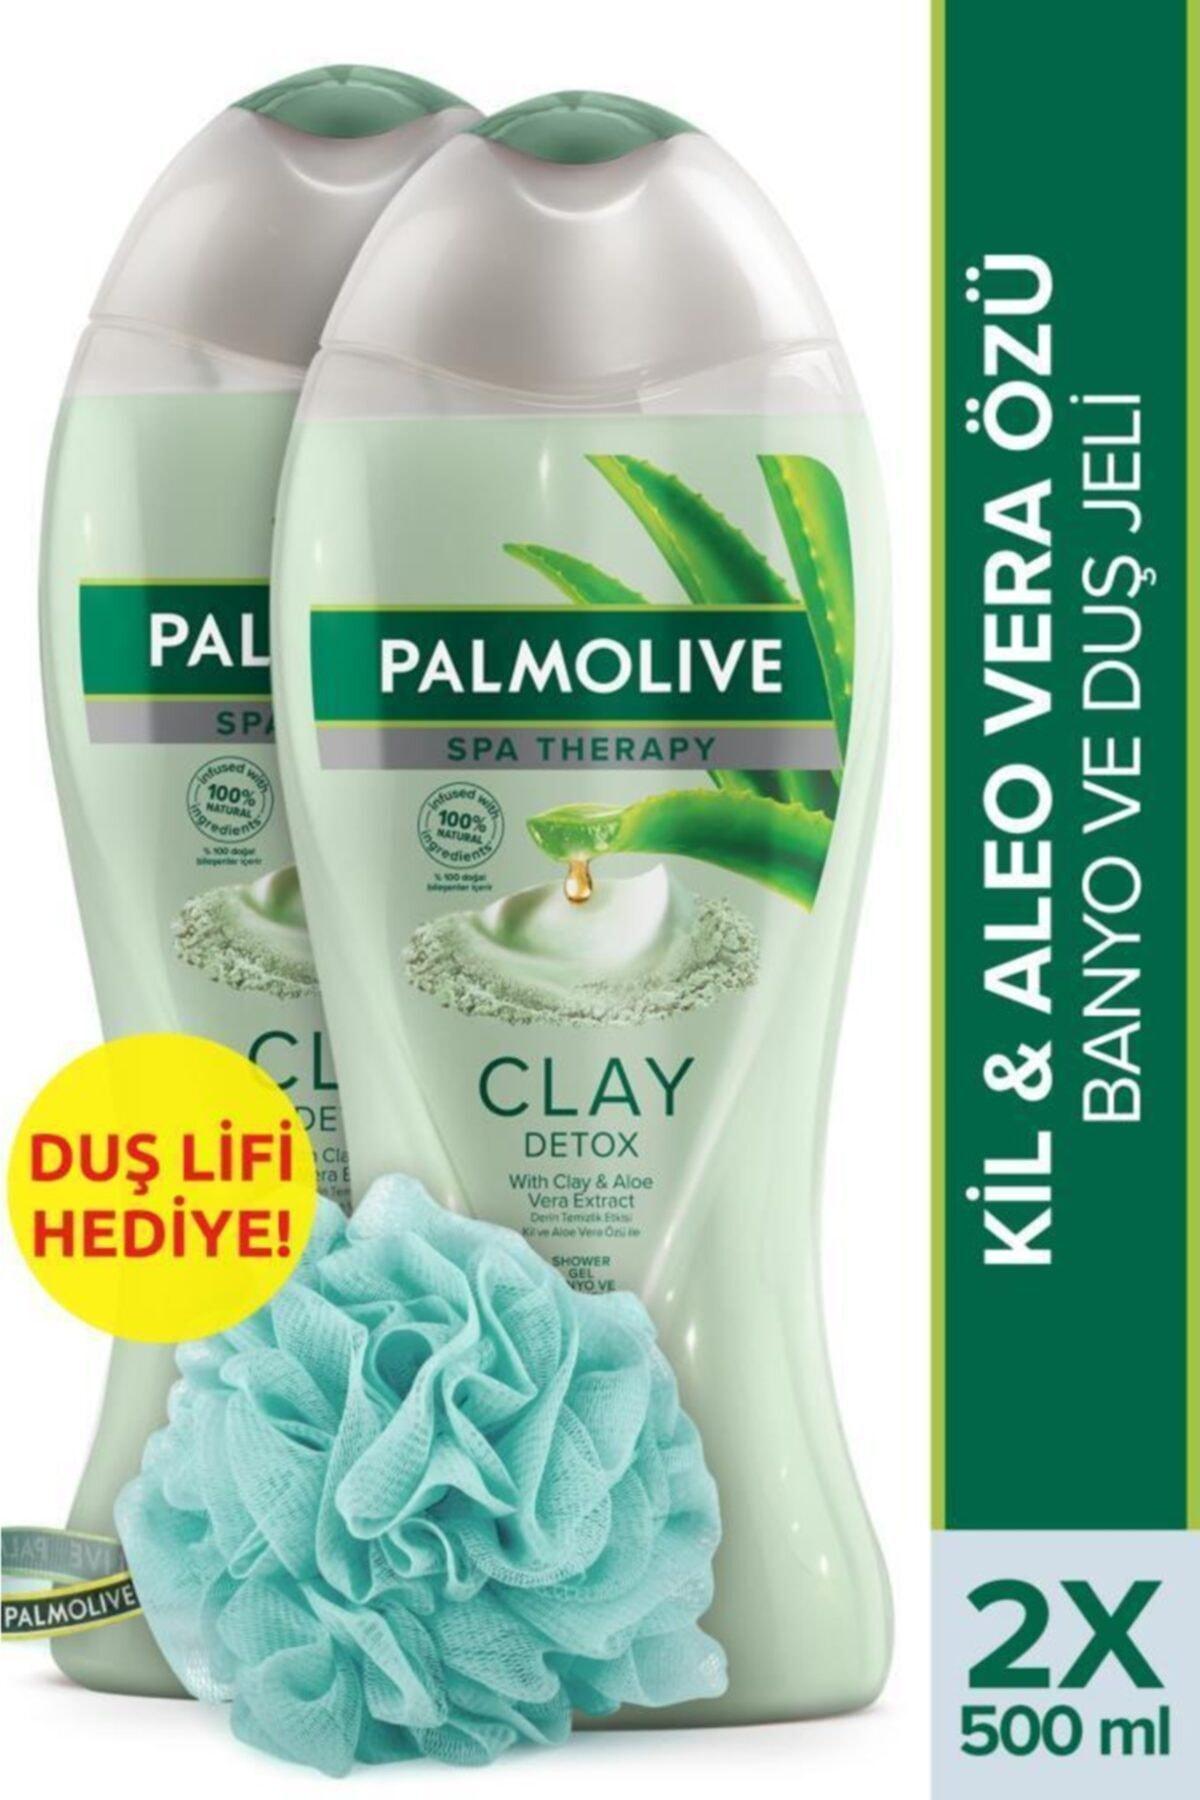 Palmolive Spa Therapy Clay Detox Kil Ve Aloe Vera Özü Banyo Ve Duş Jeli 2x 500 ml+ Duş Lifi 1